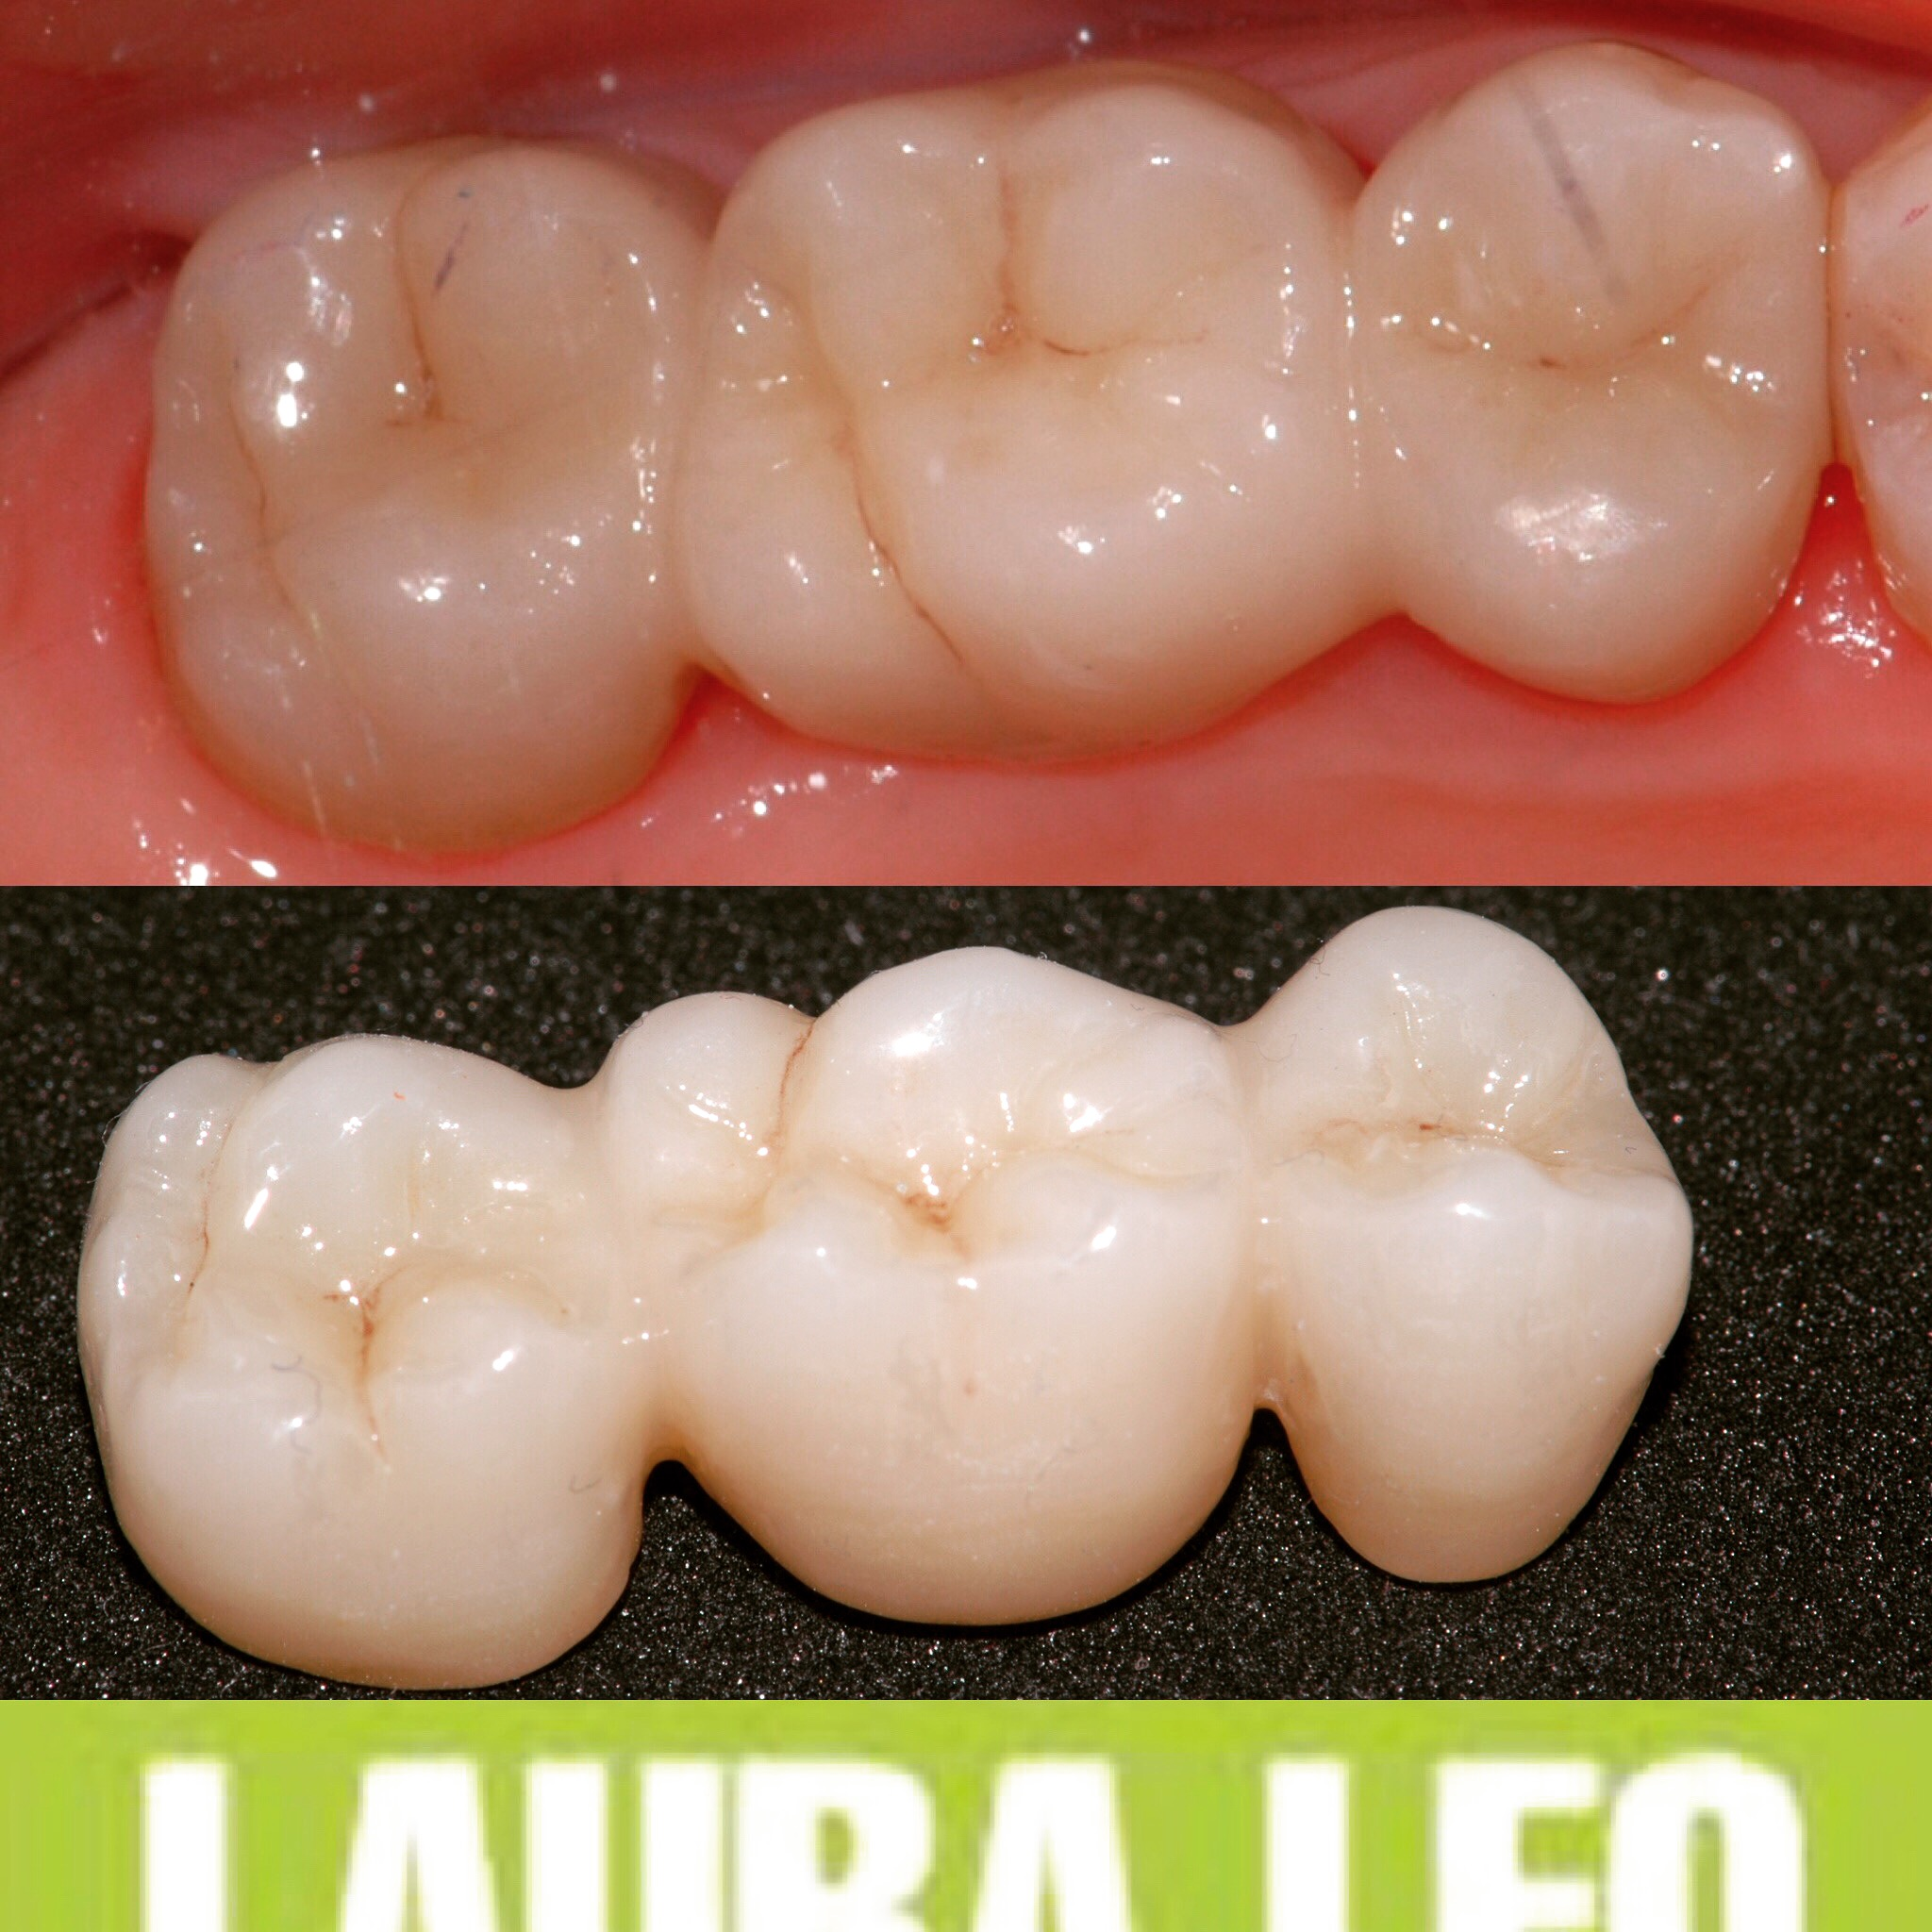 Studio Dentistico Laura Leo - Terapie - PROTESI FISSA